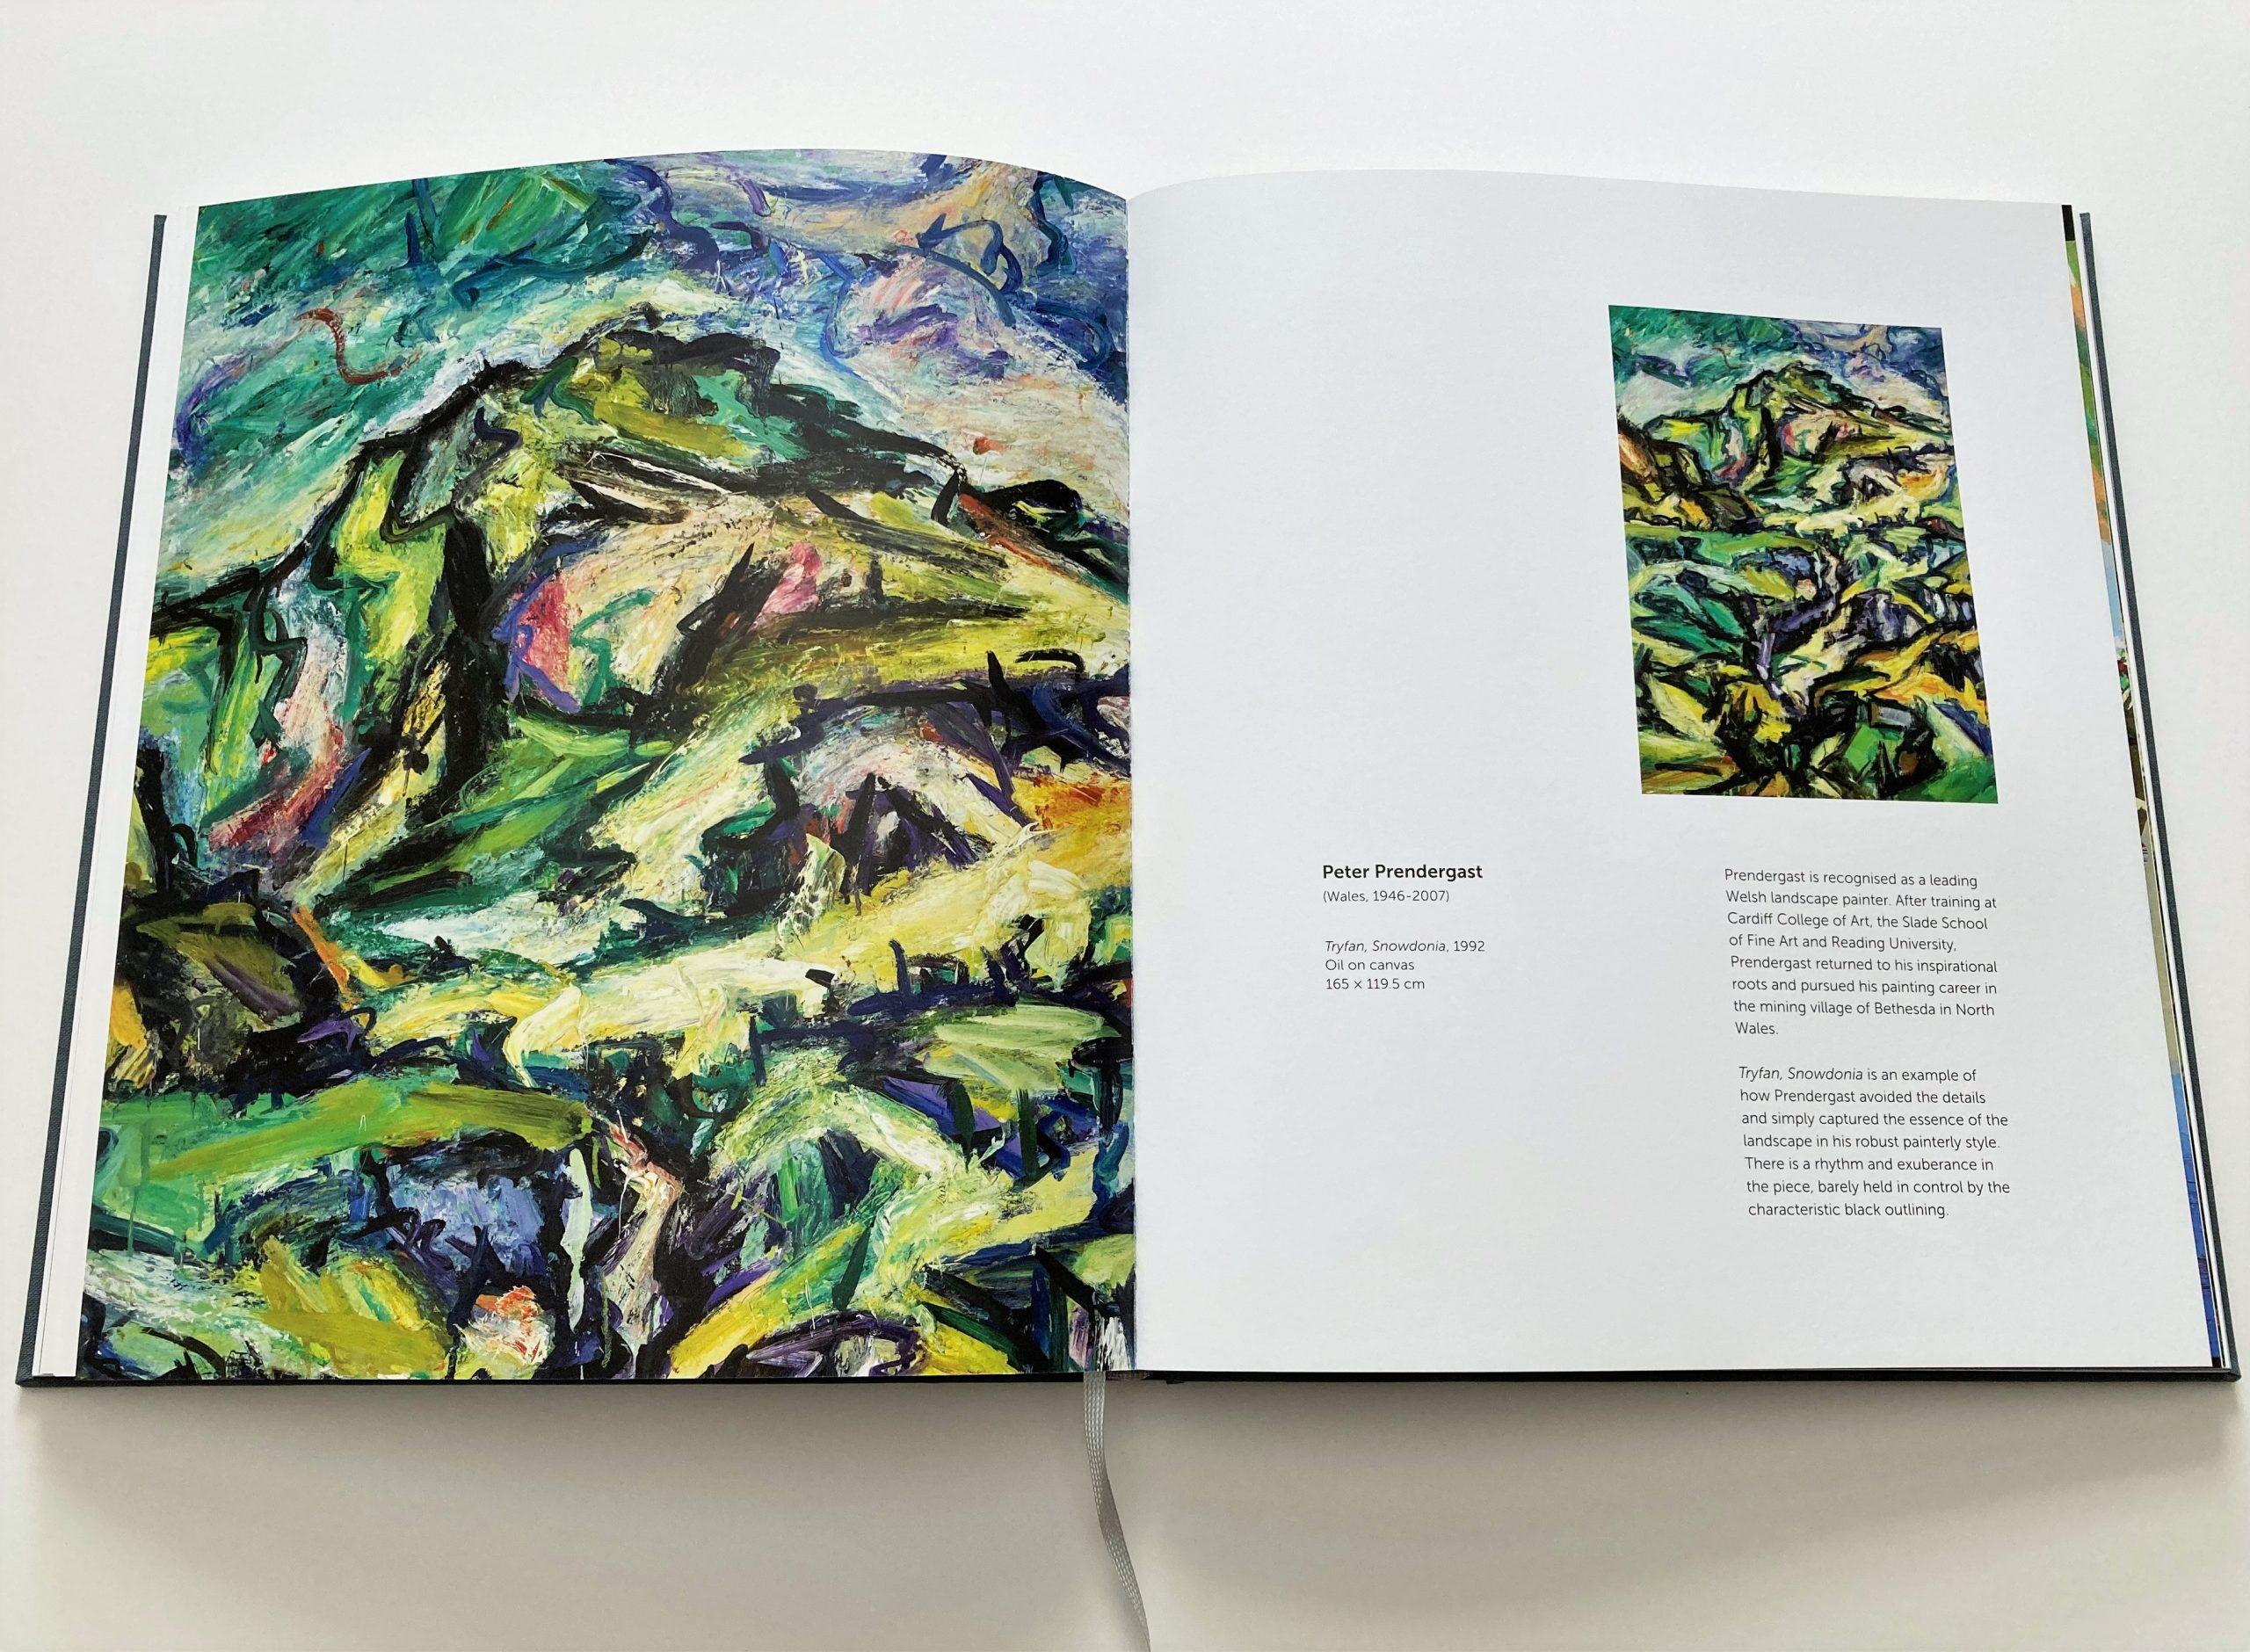 Peter Prendergast artist catalogue page